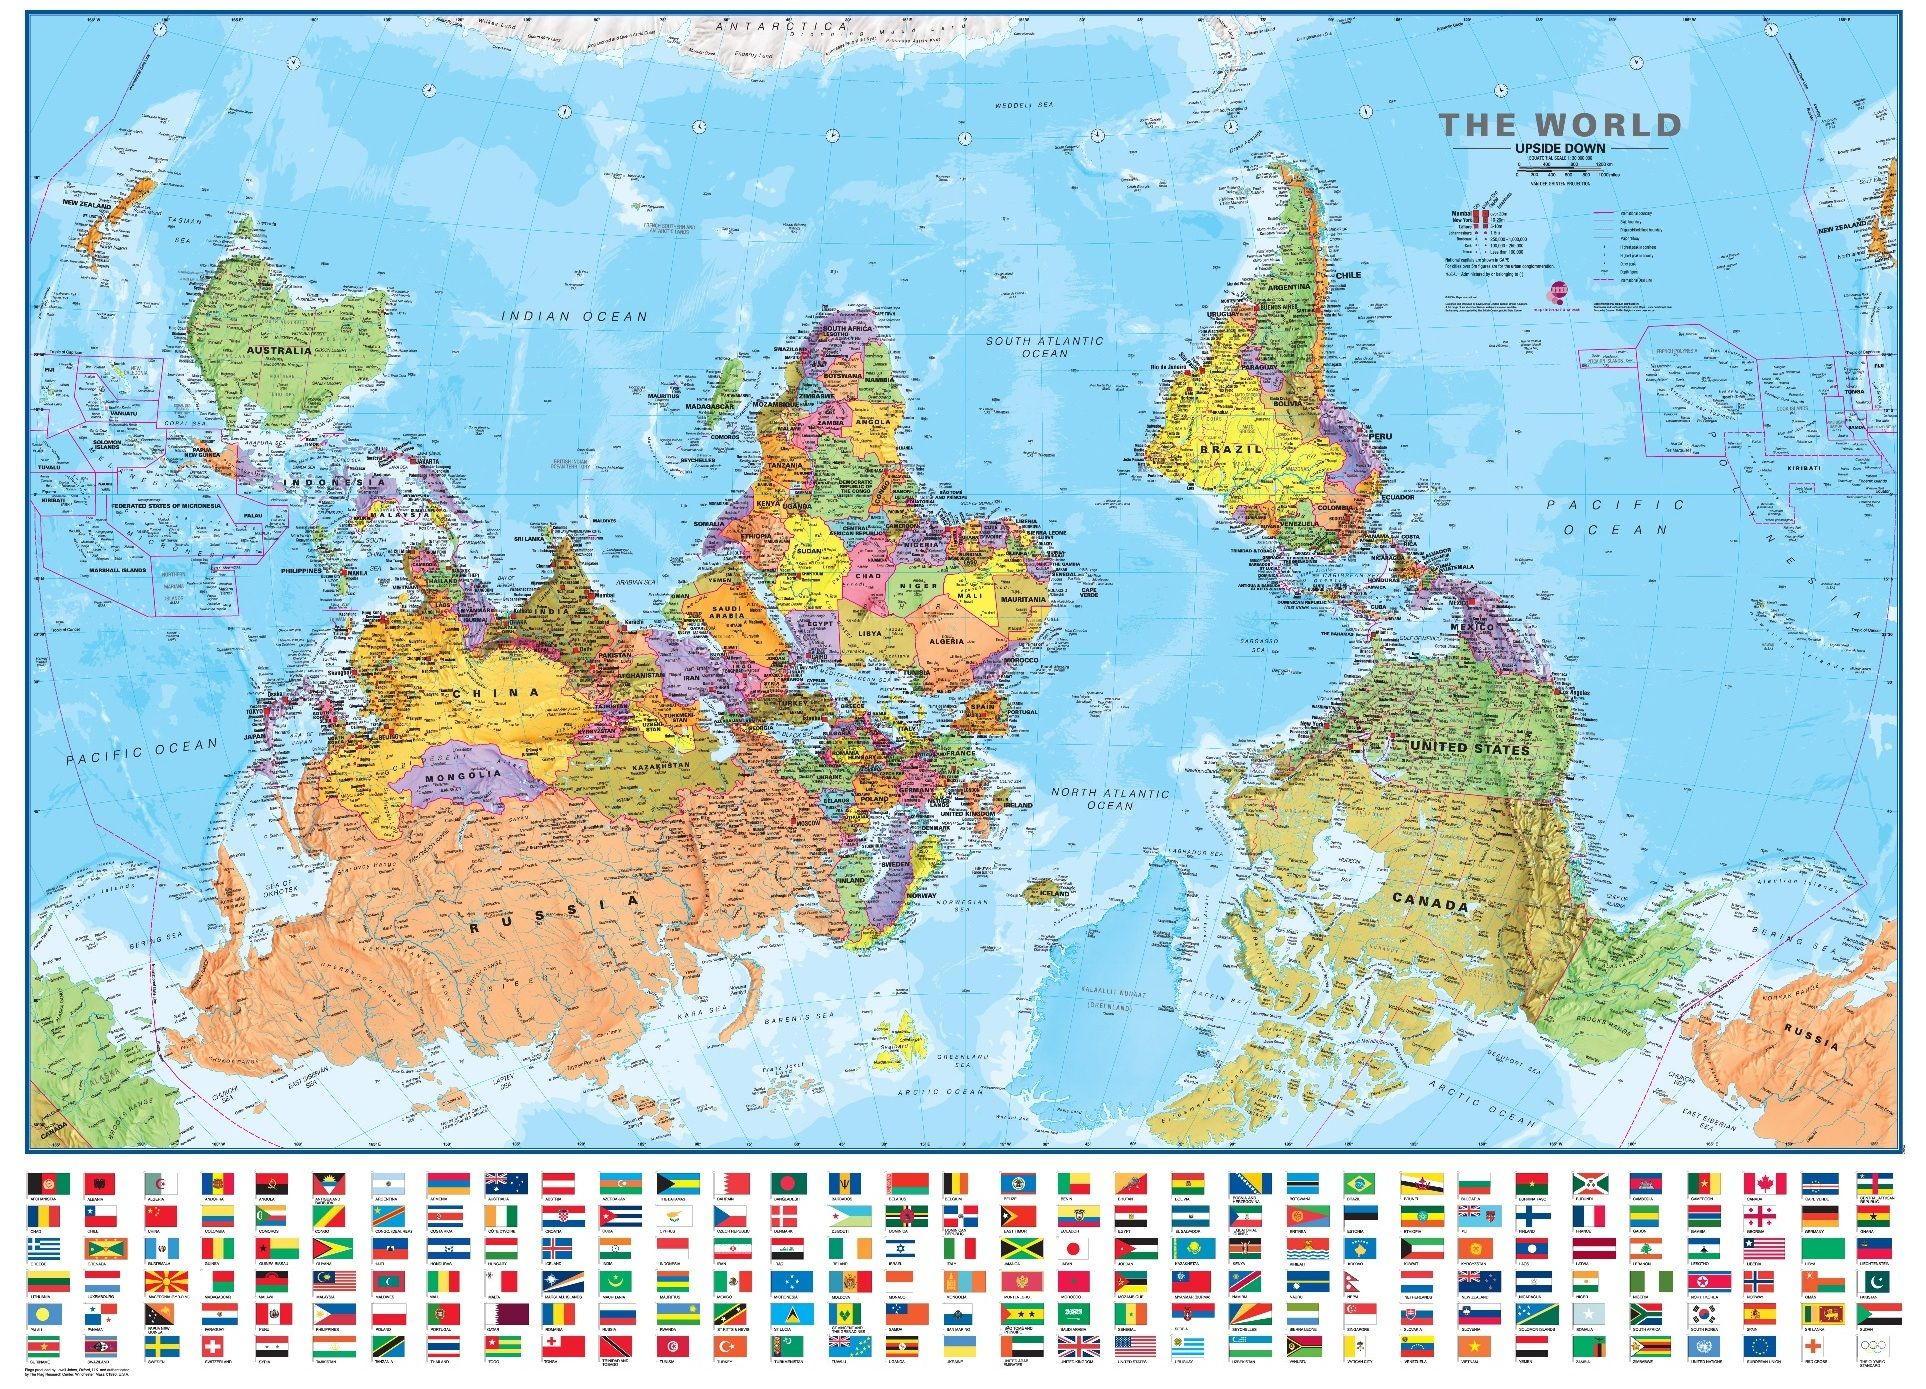 Worldmap upside down images in 2018 pinterest worldmap and worldmap upside down gumiabroncs Image collections